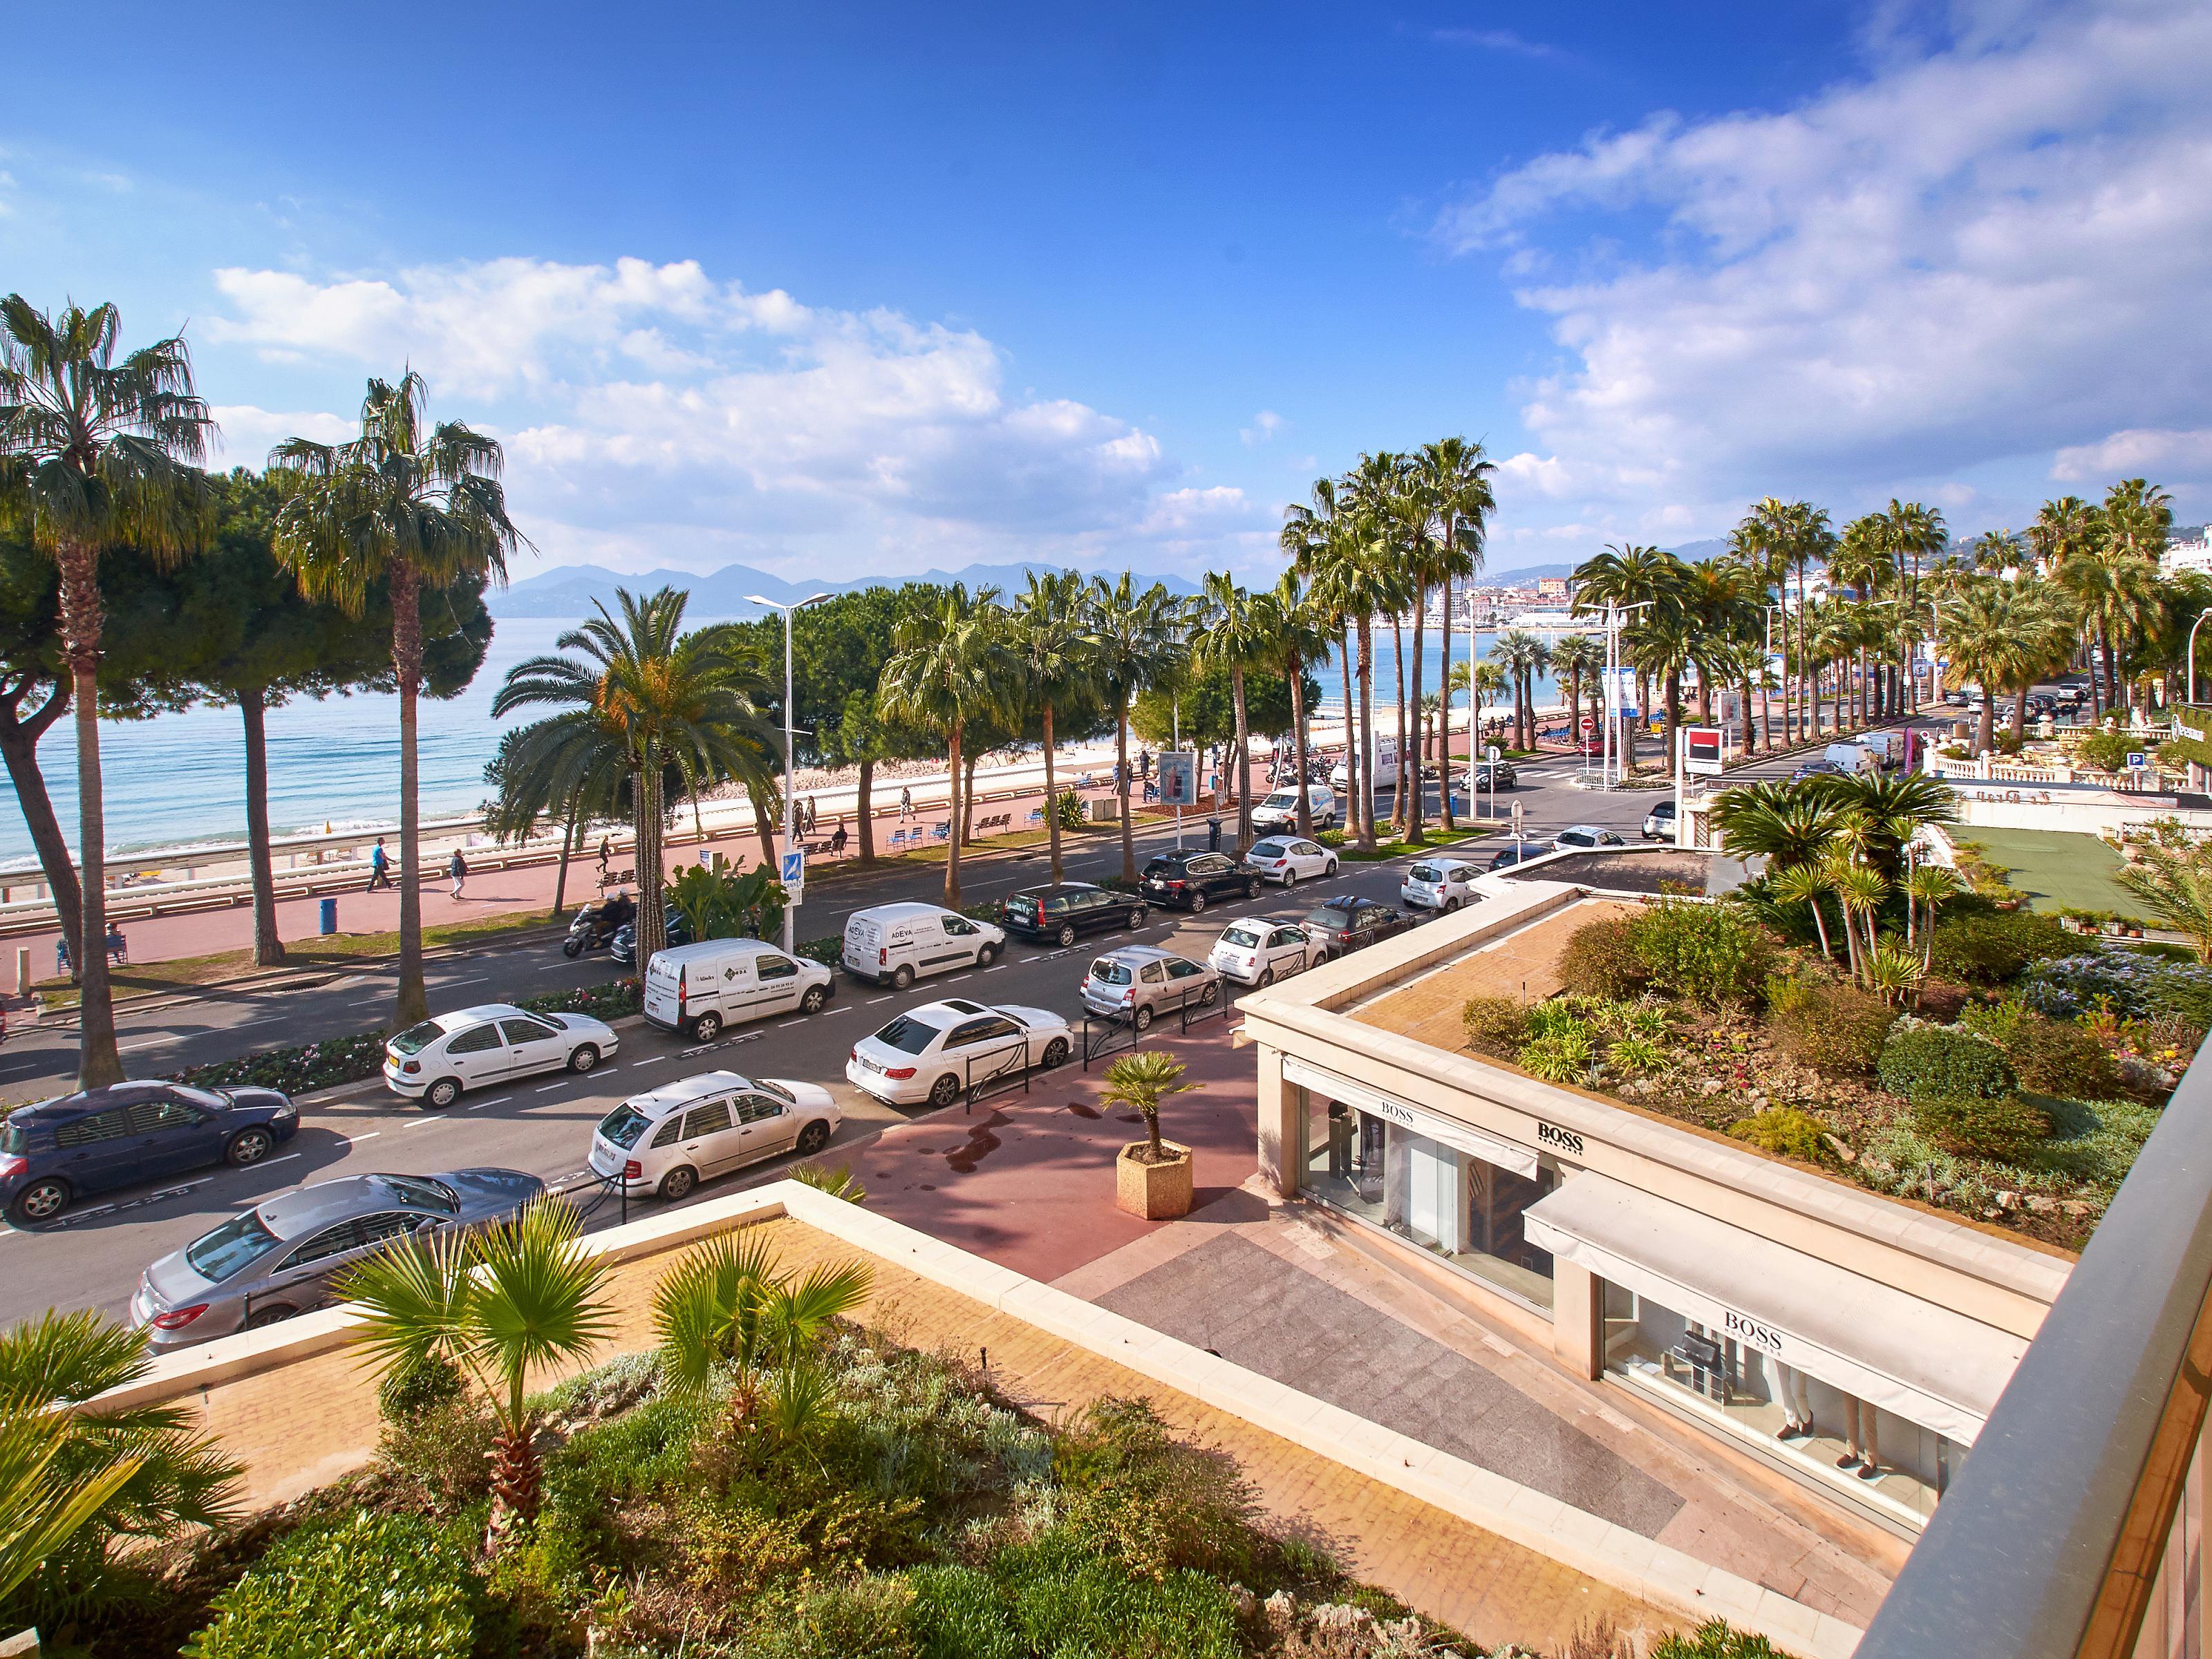 公寓 为 销售 在 Luxurious 3 roomed apartment with panoramic sea views Cannes, 普罗旺斯阿尔卑斯蓝色海岸 06400 法国